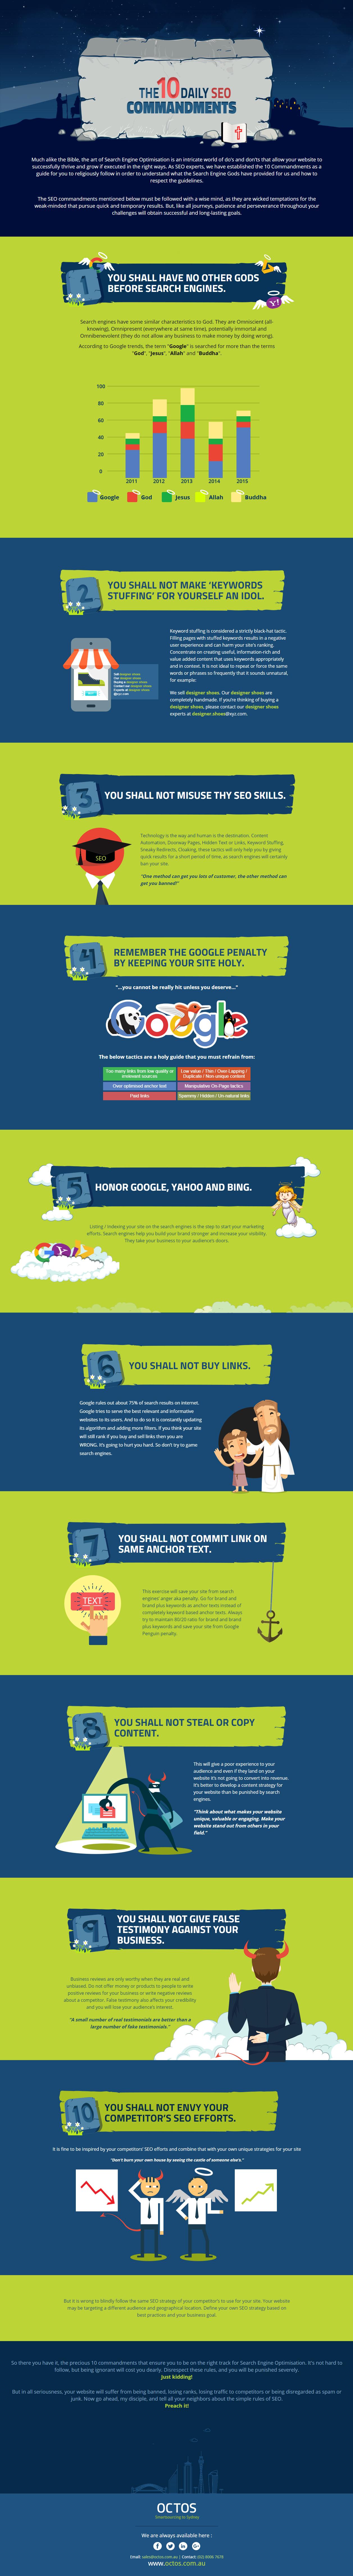 The SEO List of 10 Commandments - Infographic